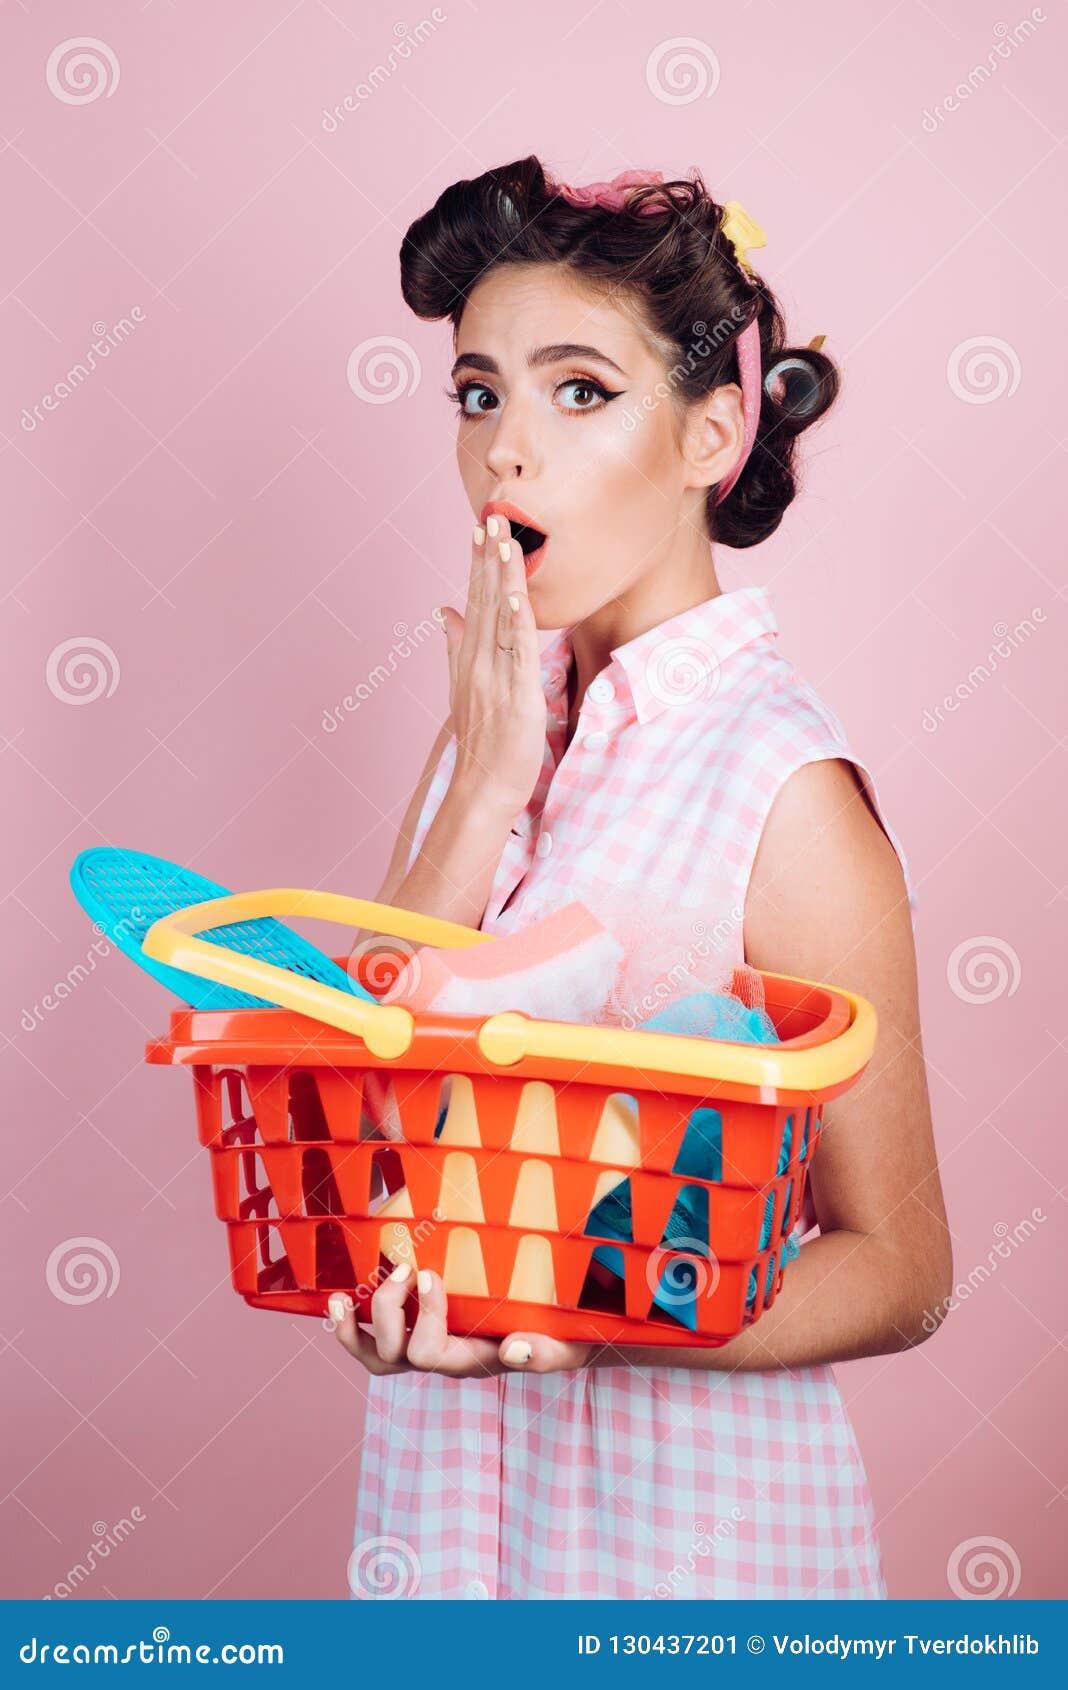 Savings on purchases. retro woman go shopping with full cart. surprised girl enjoying online shopping. online shopping